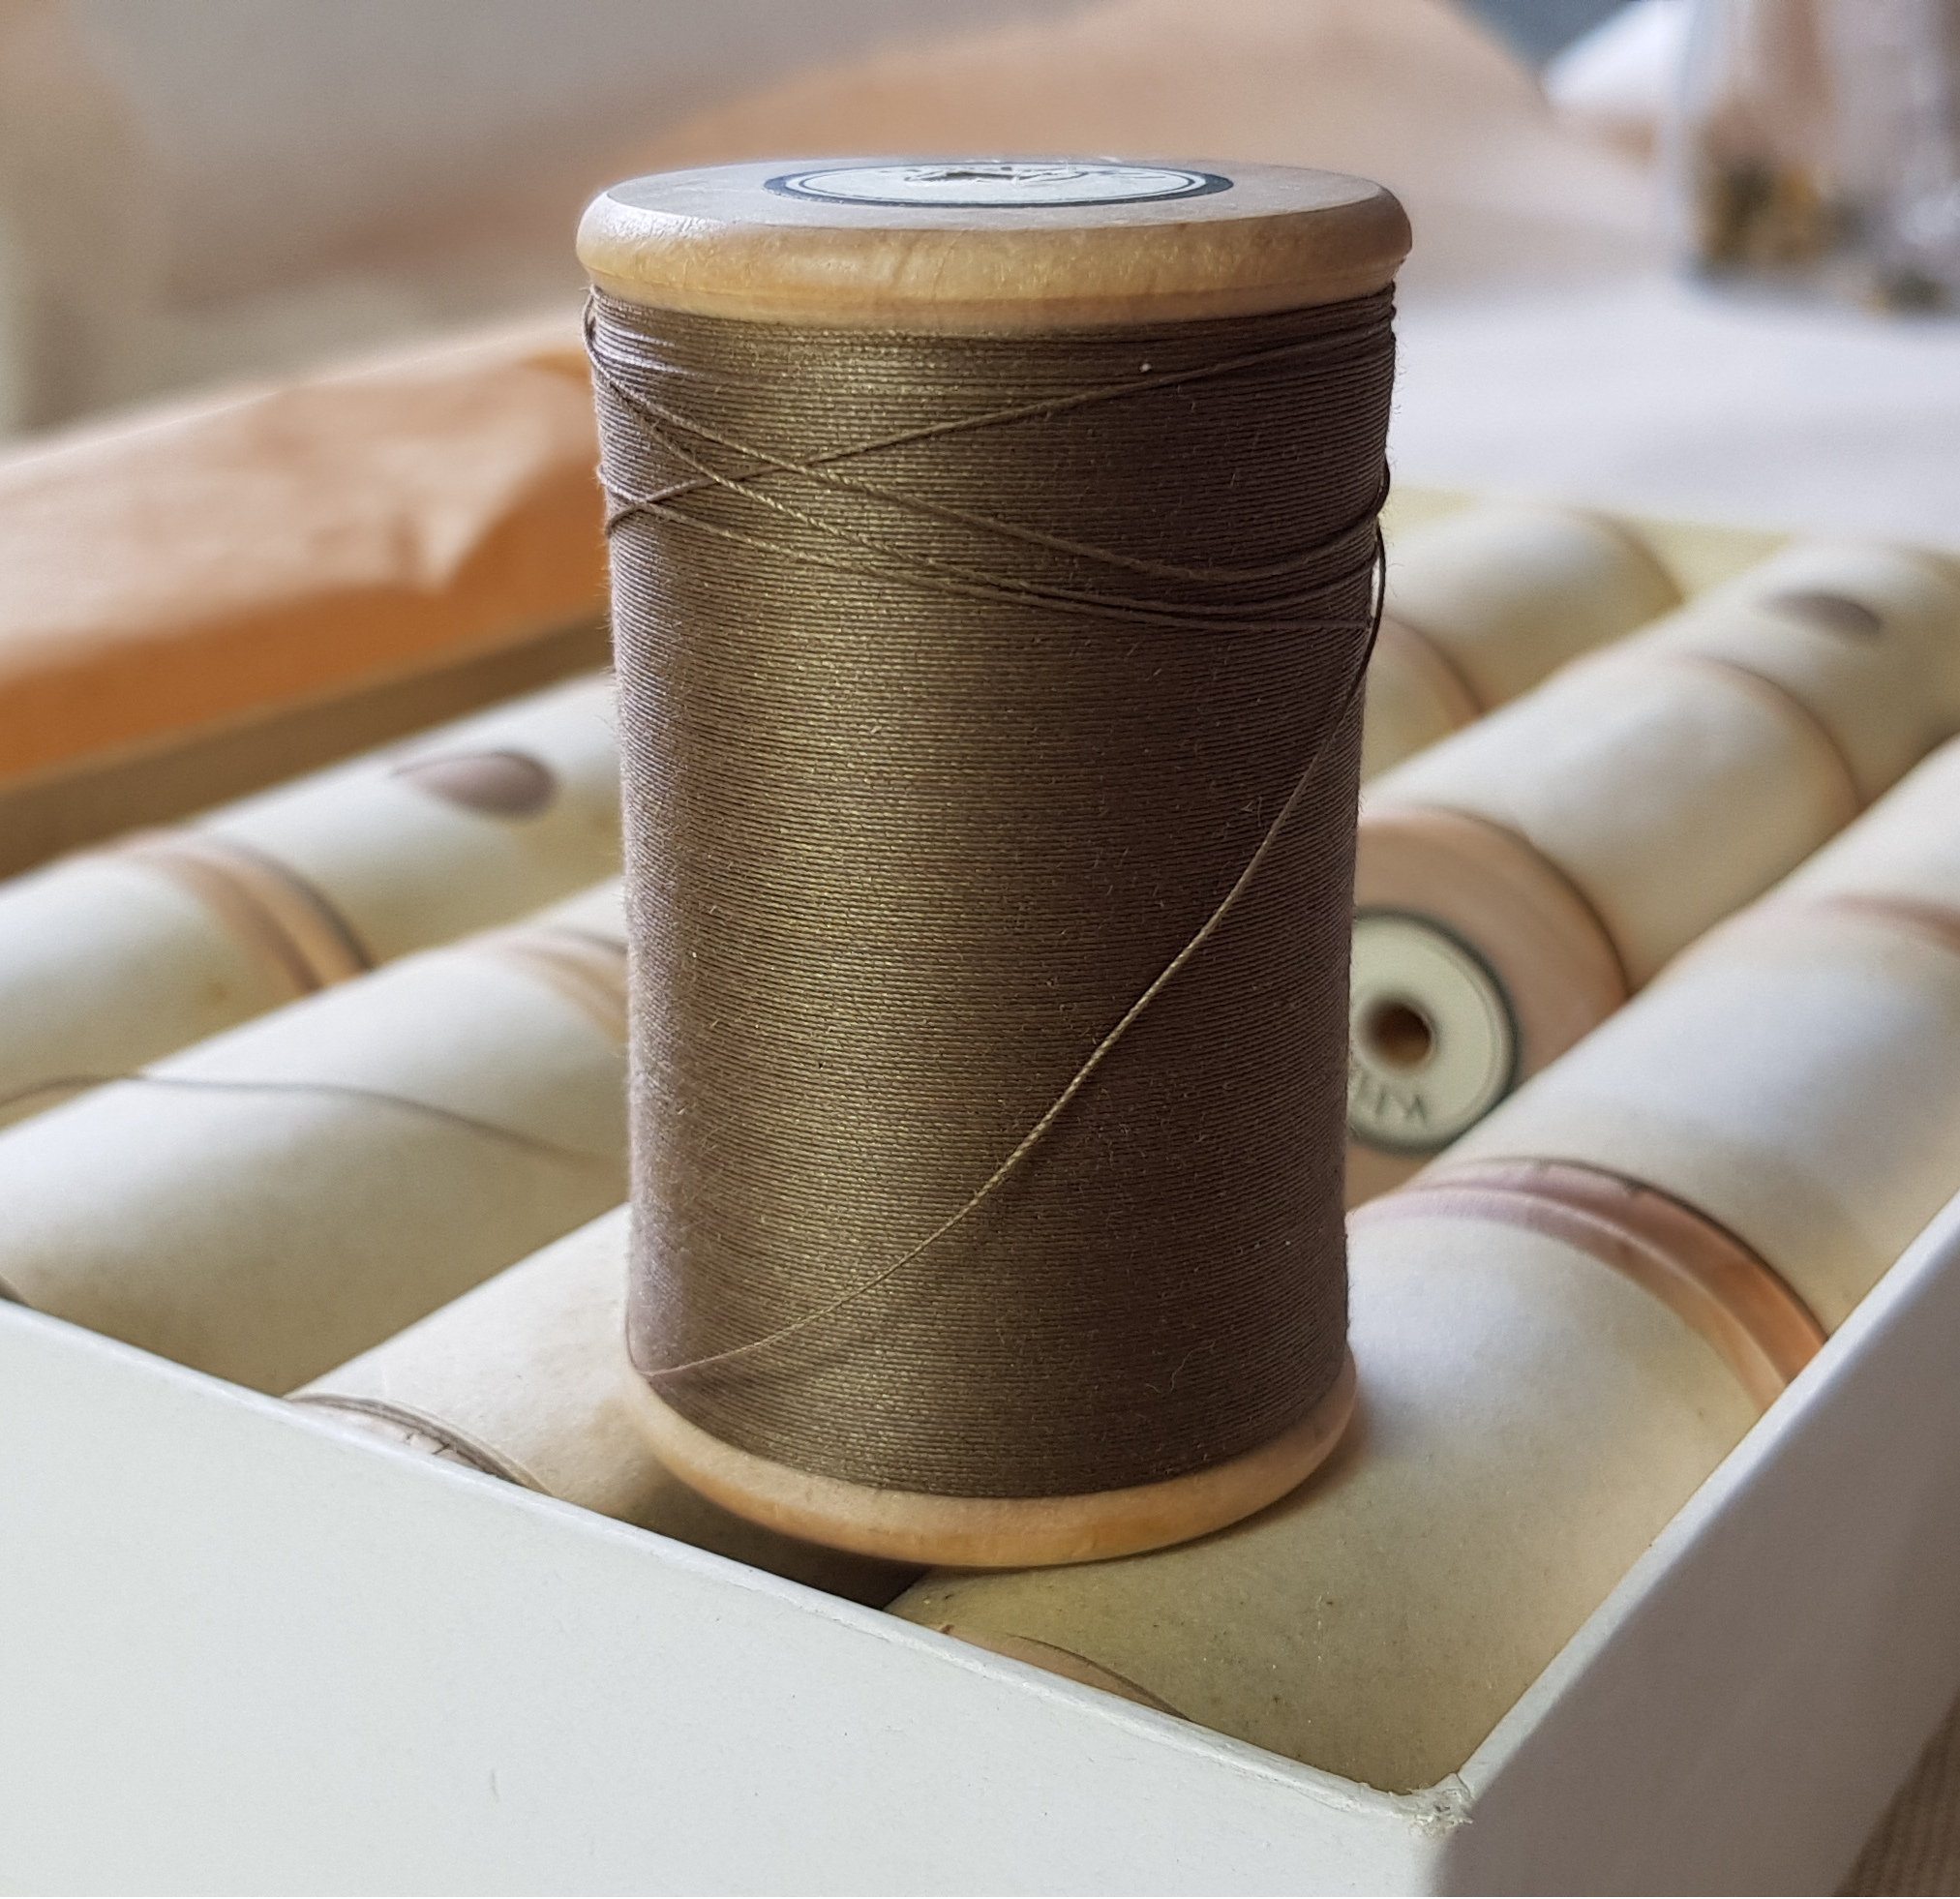 Khaki Thread on wooden spool 00000